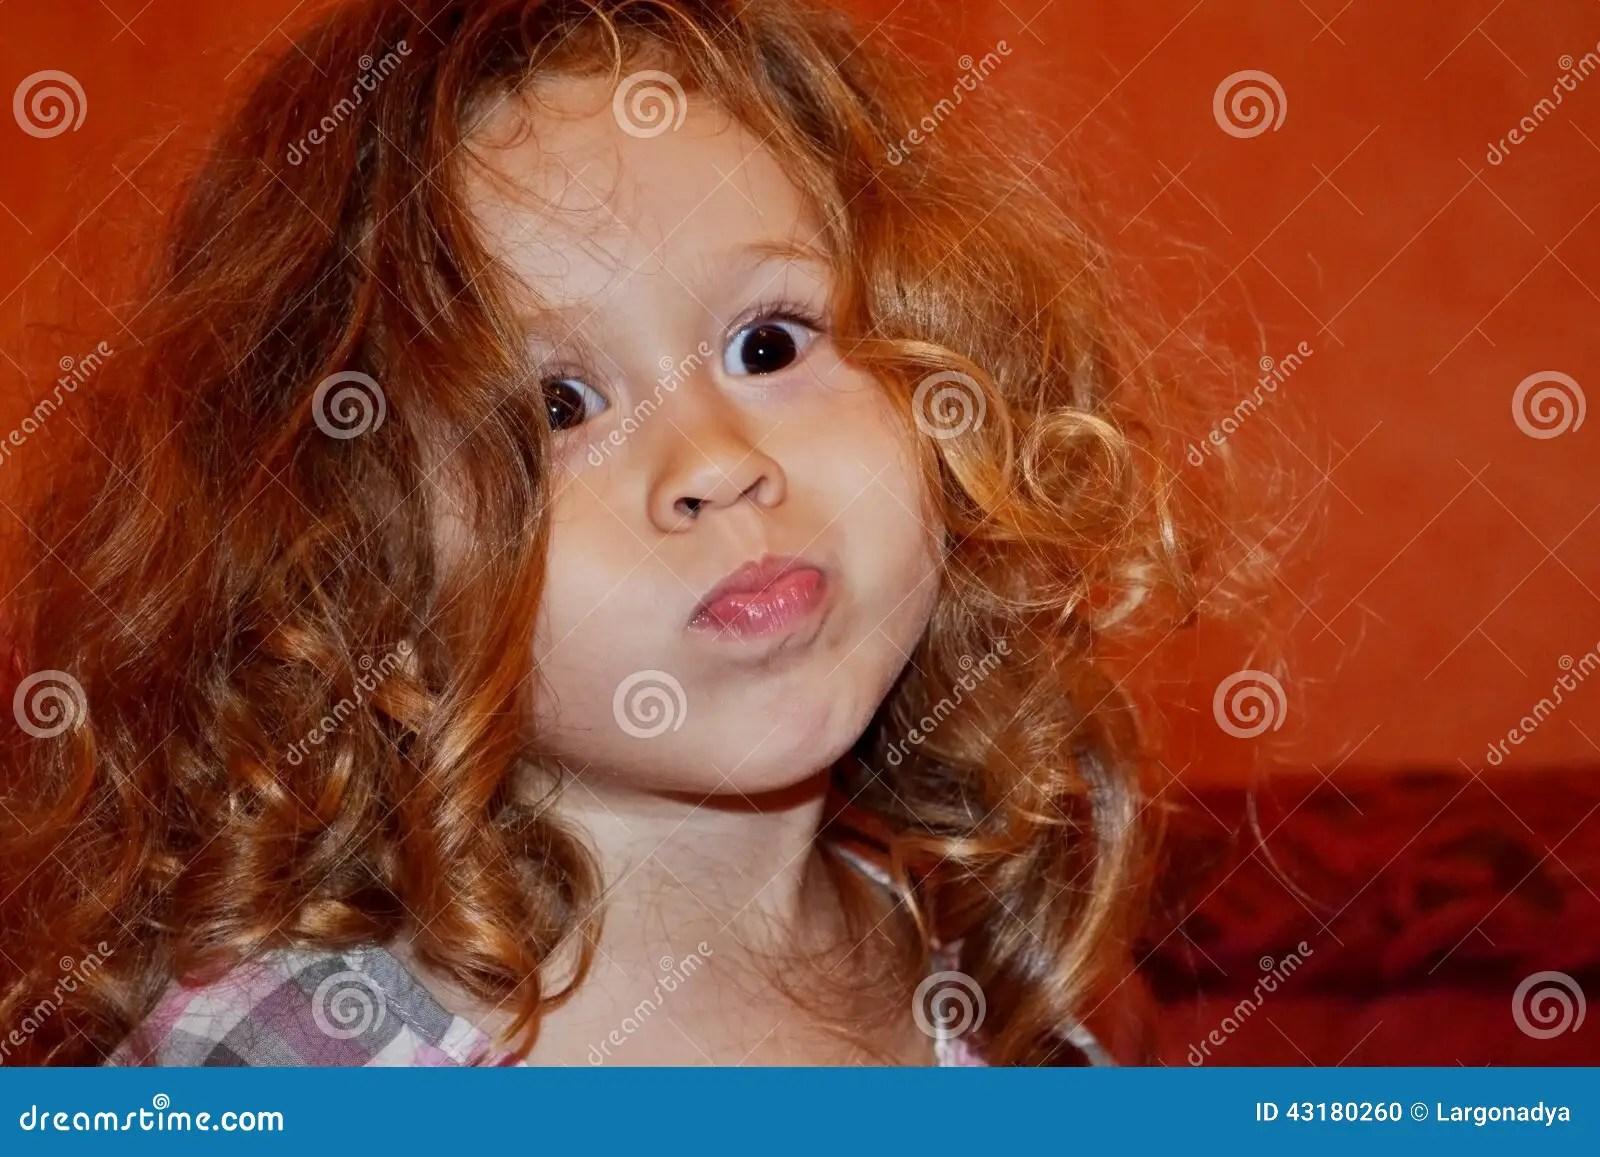 Child Grimaces. Stock Photo - Image: 43180260